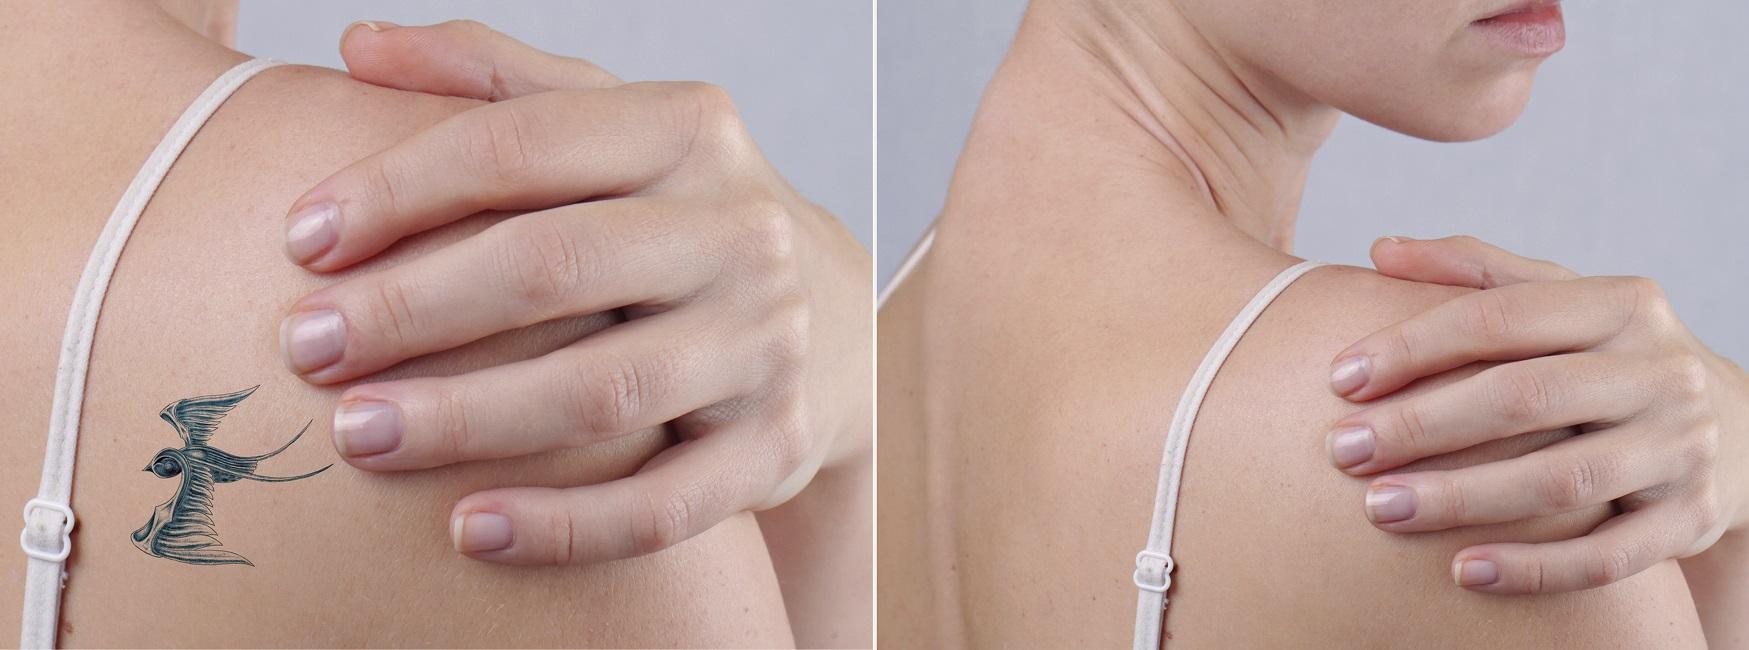 Tattoo laser verwijderen behandeling nederland